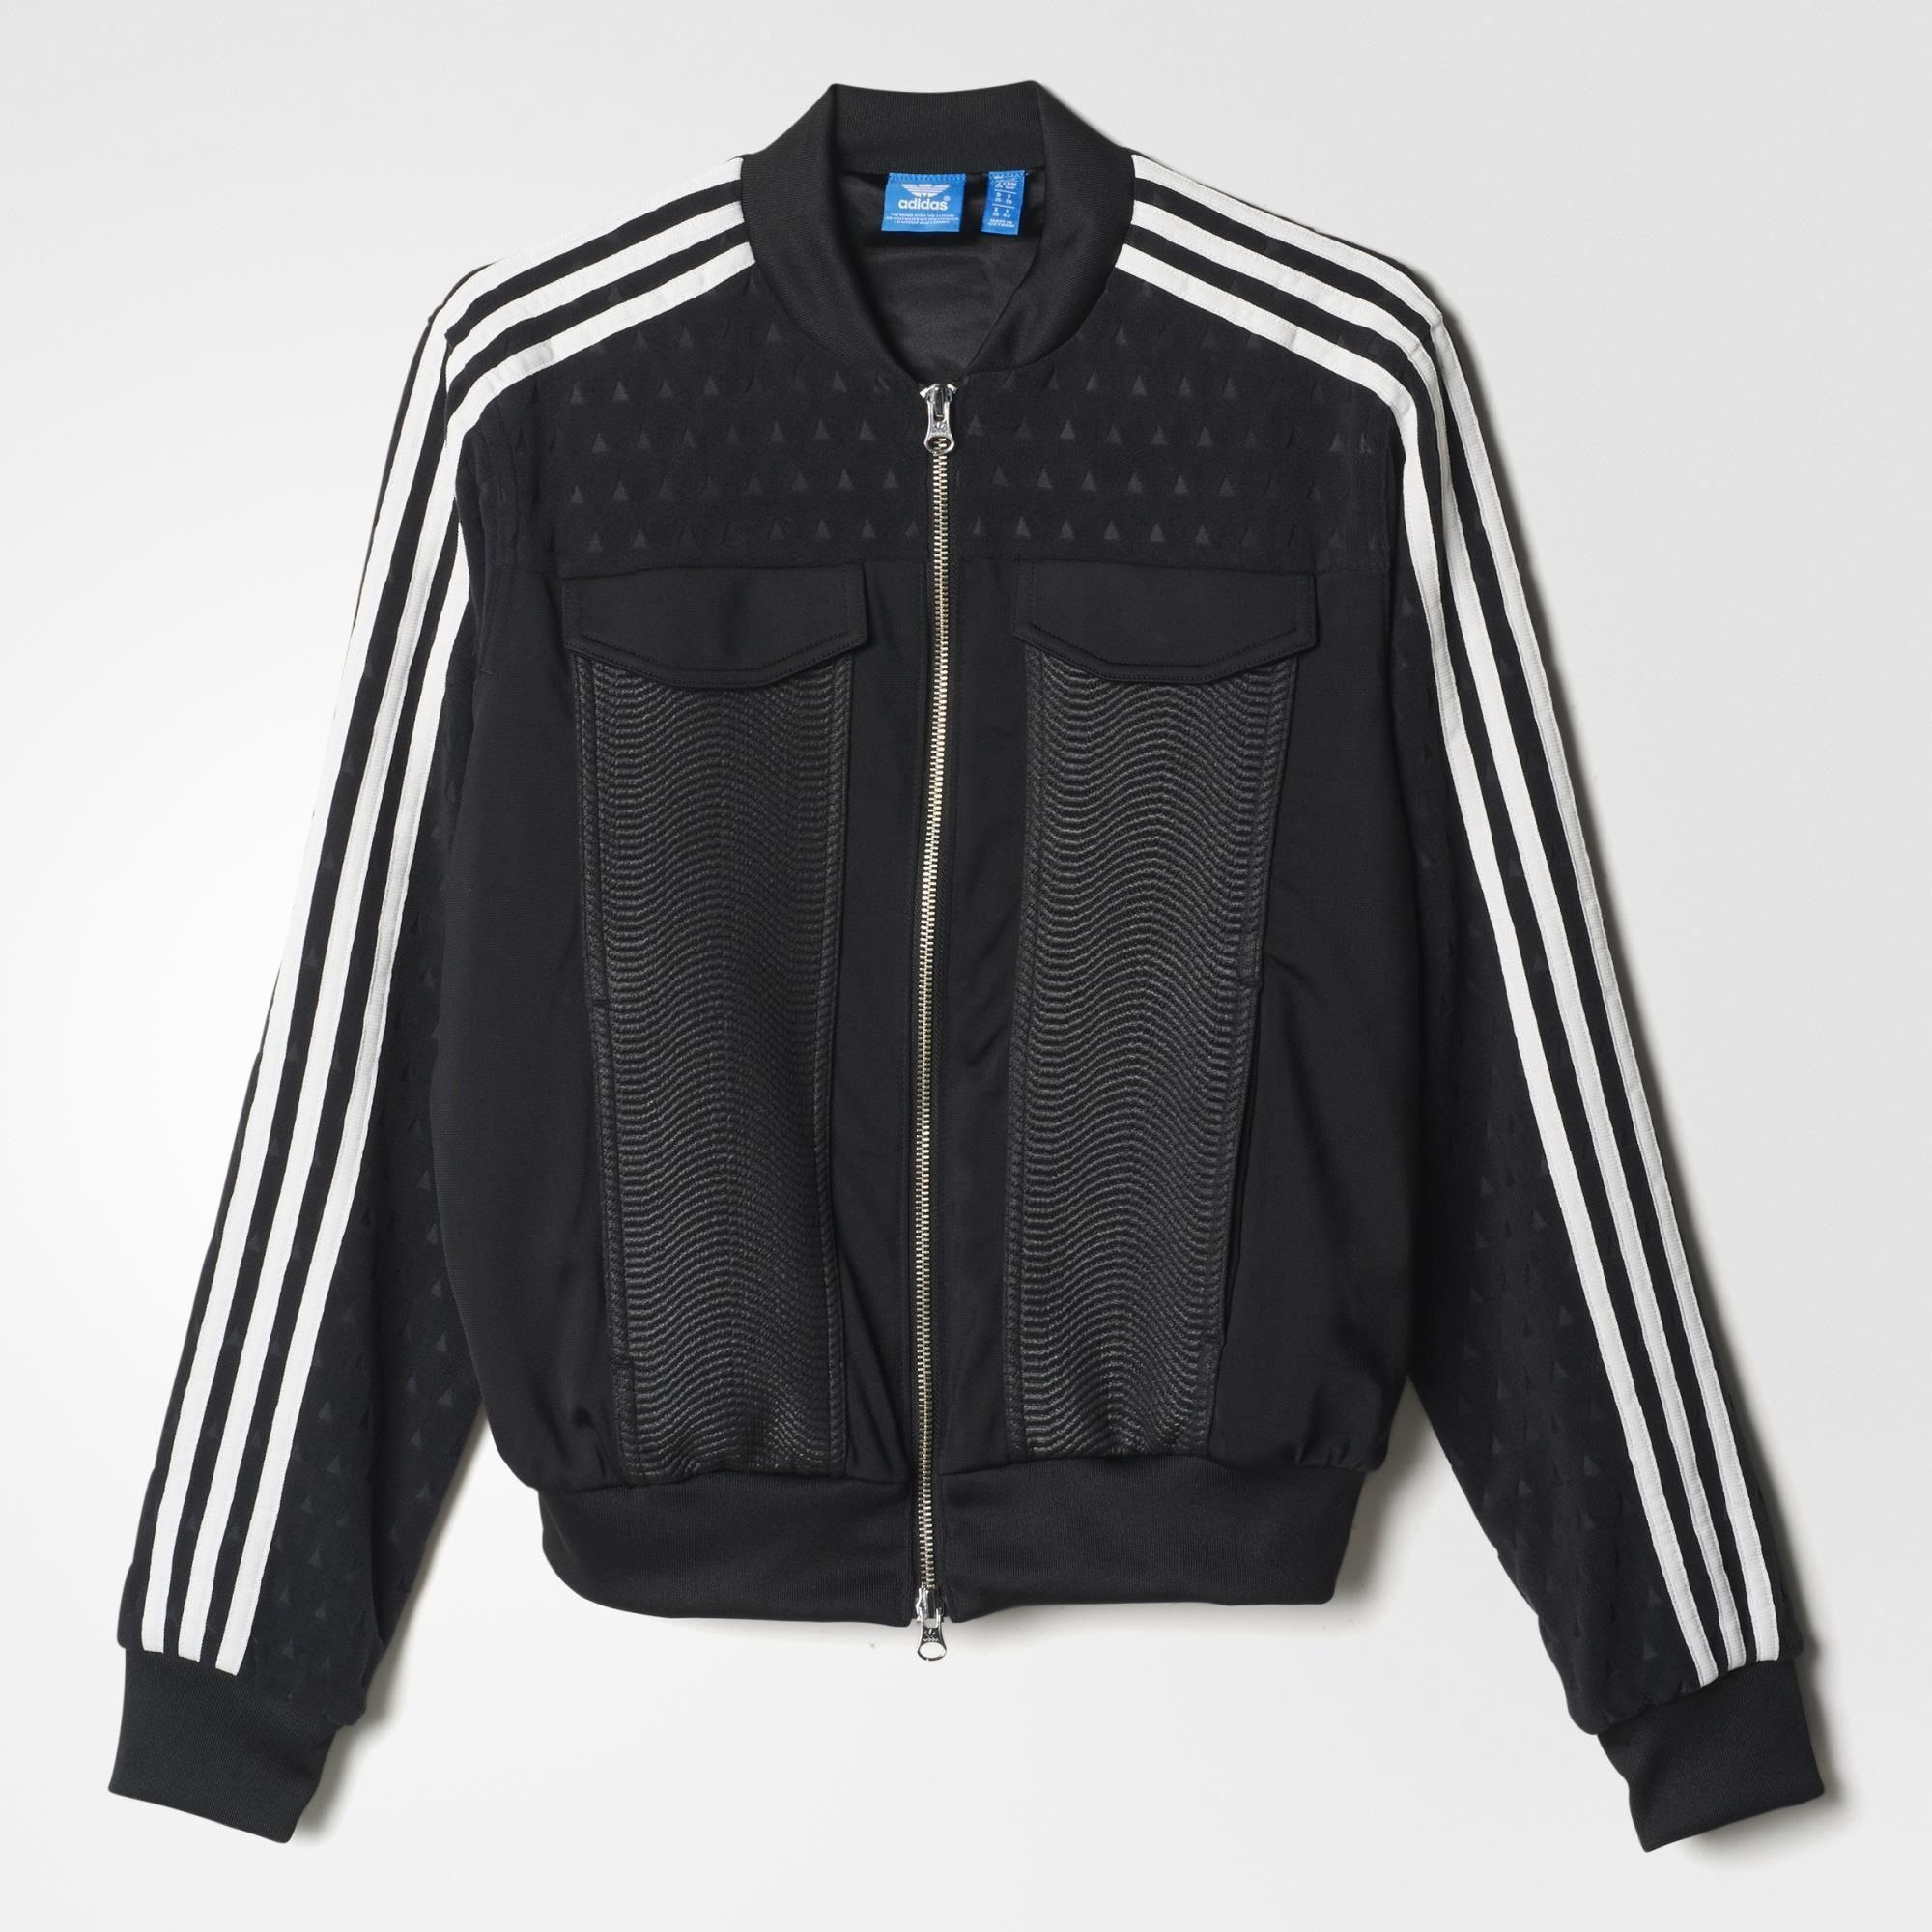 jacket, adidas, adidas originals, adidas jacket, khloe